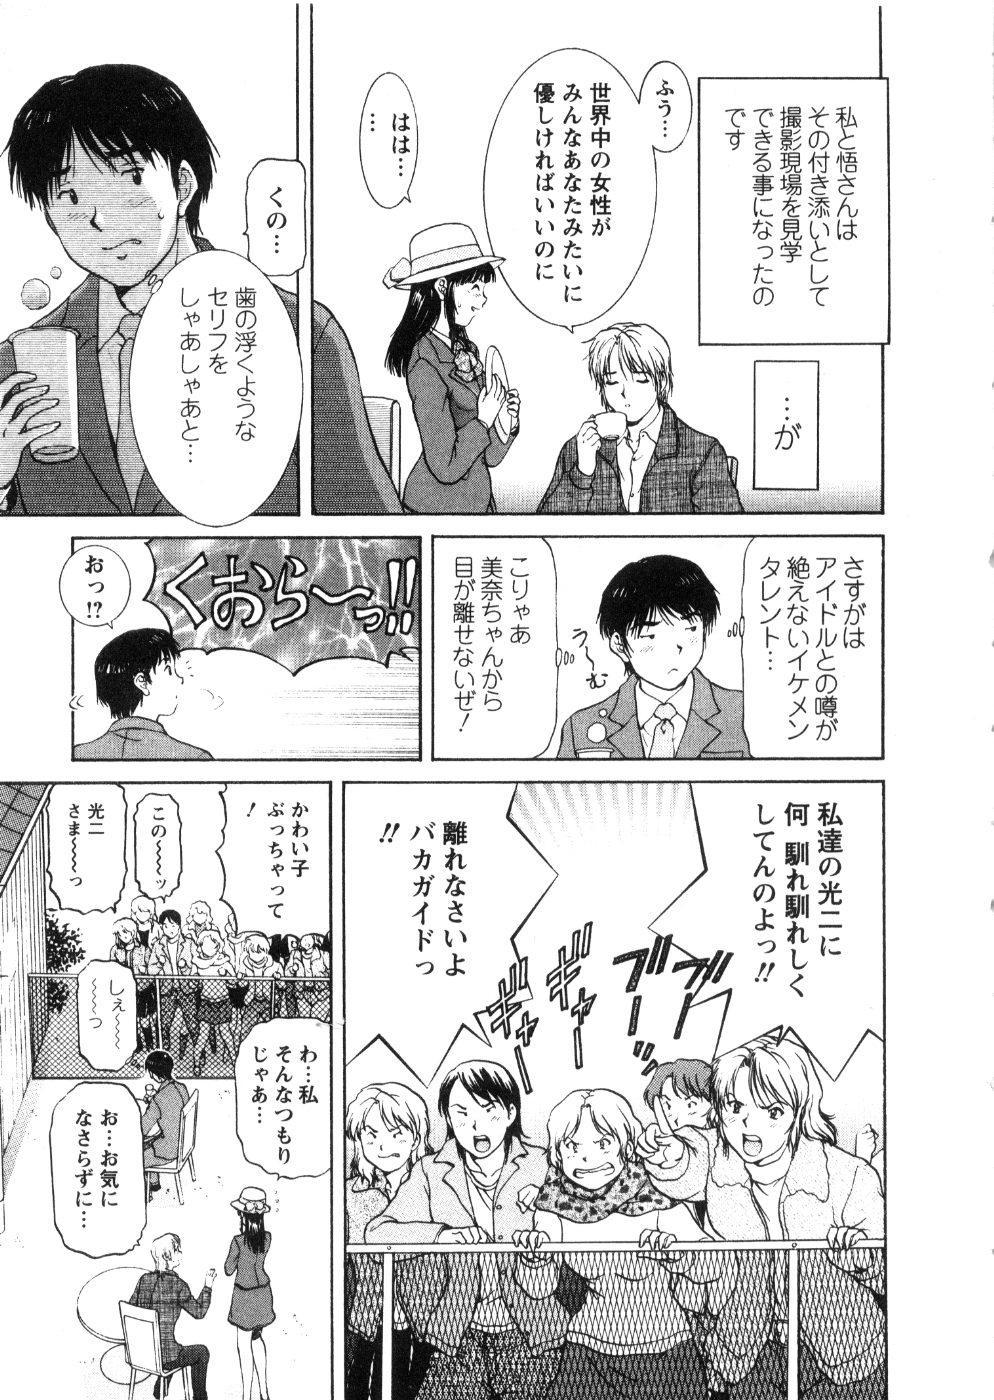 Oneechan-tachi ga Yatte Kuru 03 154